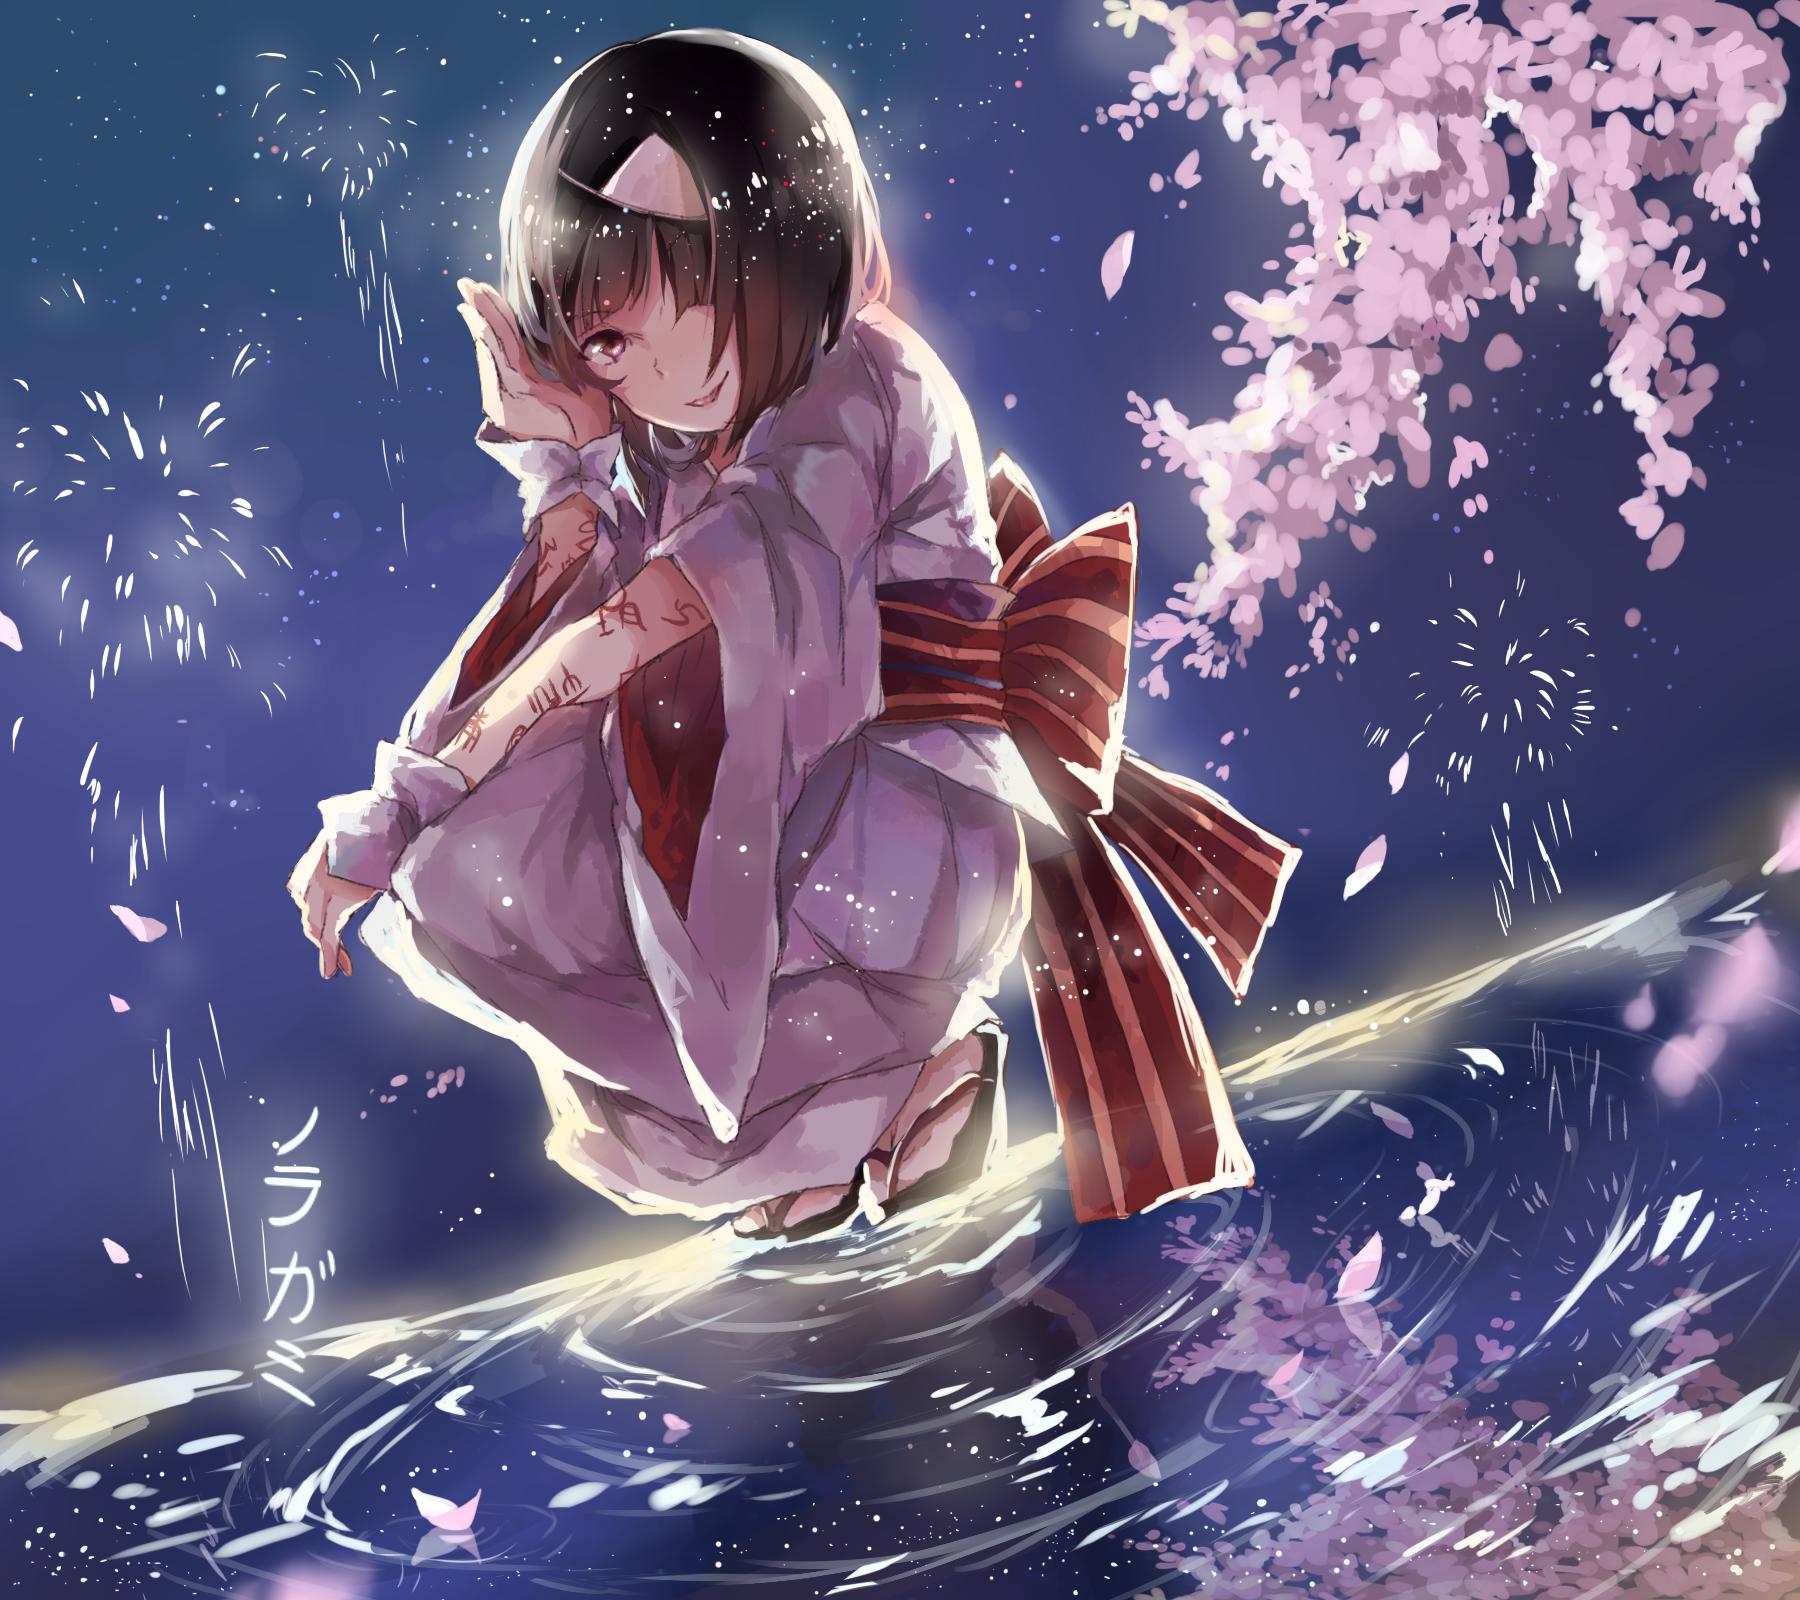 The Stray by Kanekiru